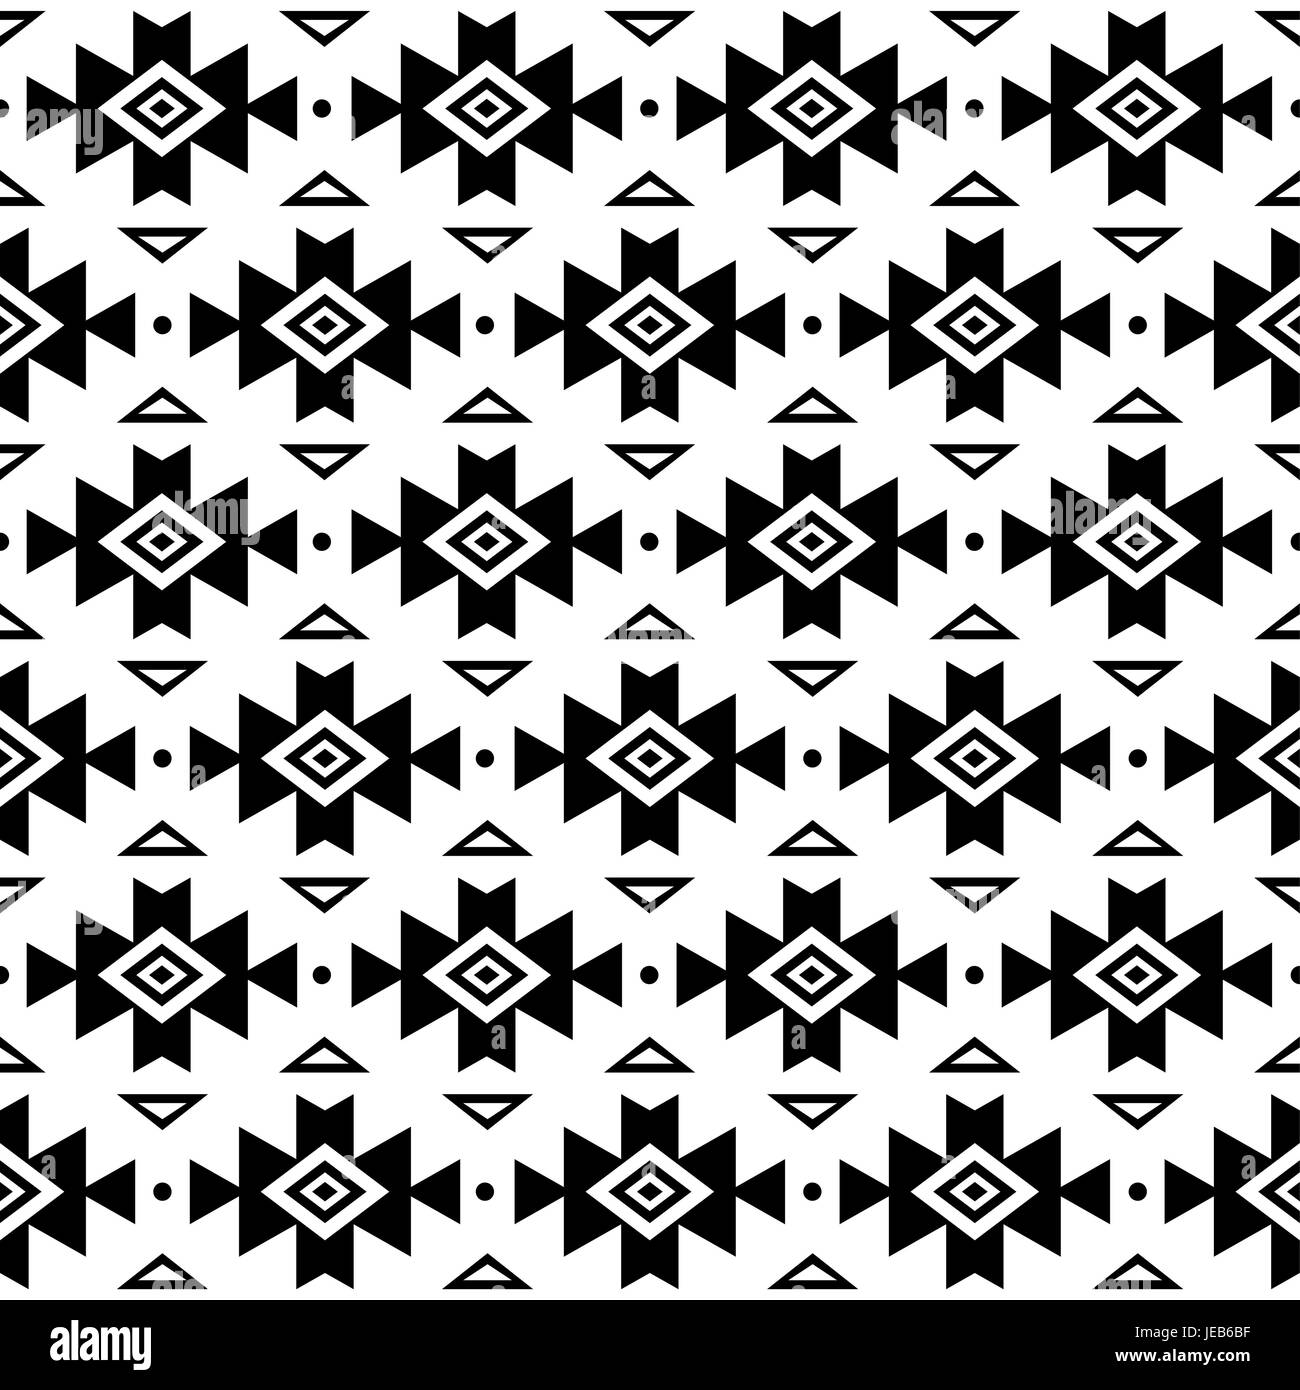 folklore mexico stockfotos folklore mexico bilder seite 4 alamy. Black Bedroom Furniture Sets. Home Design Ideas